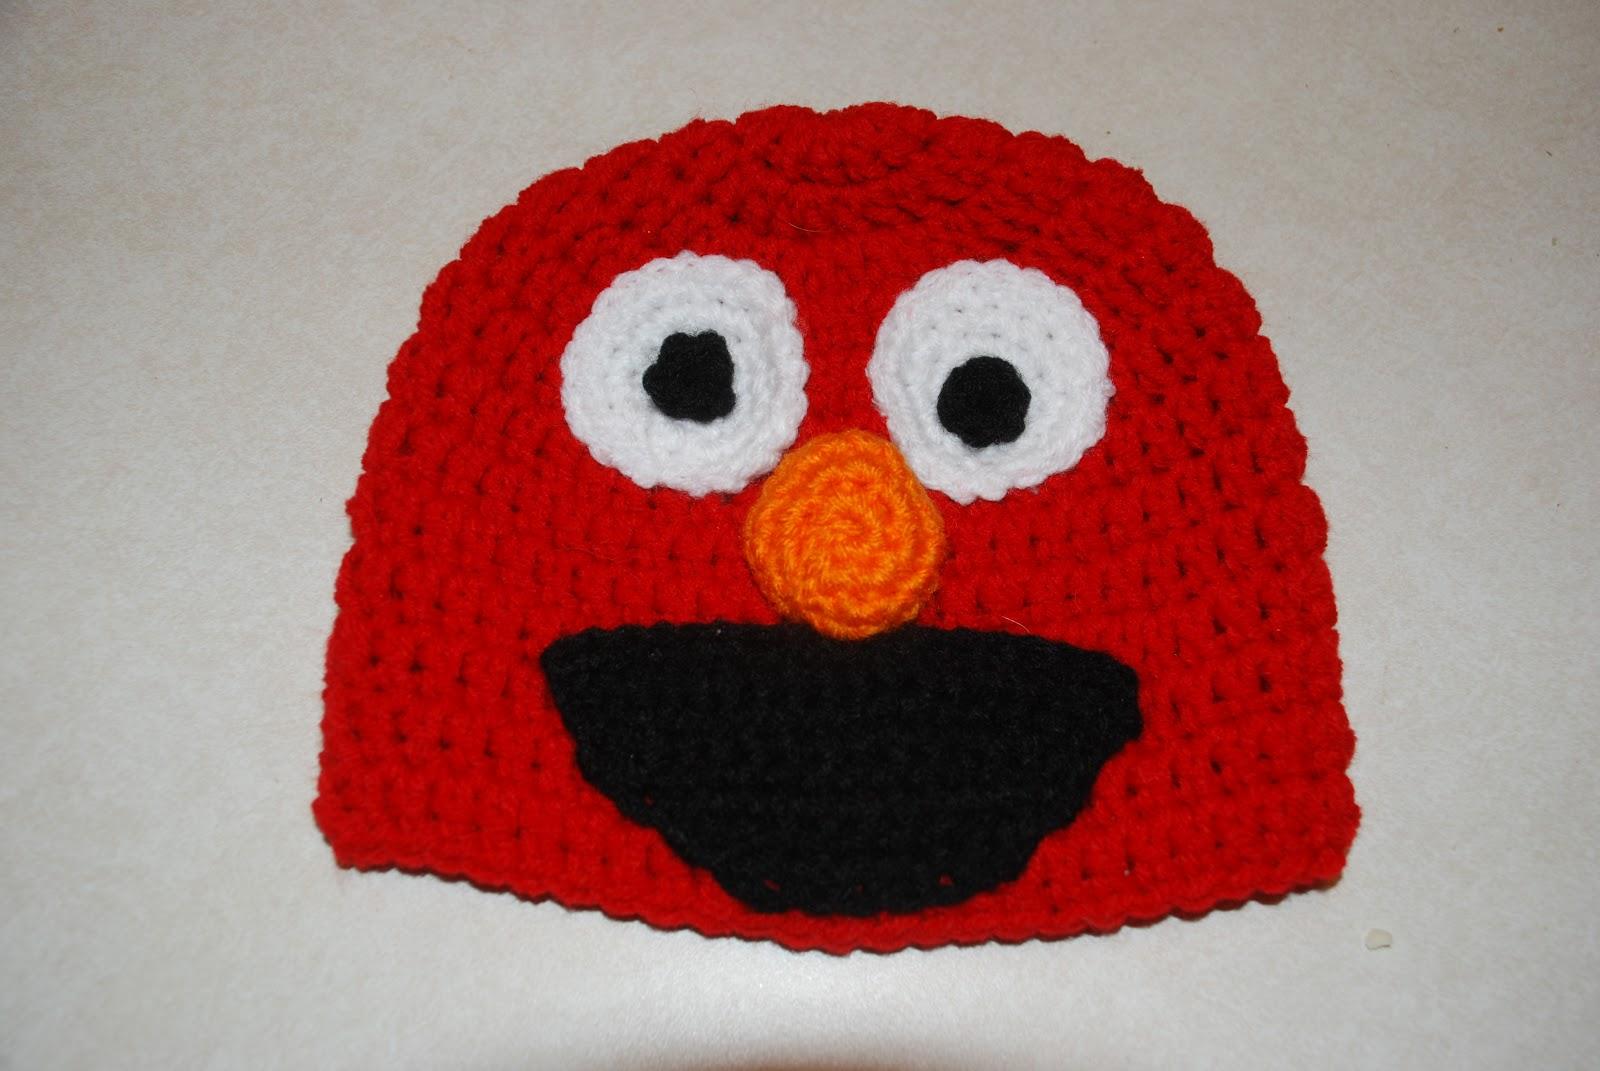 Free Crochet Patterns For Elmo Hat : Elmo hat